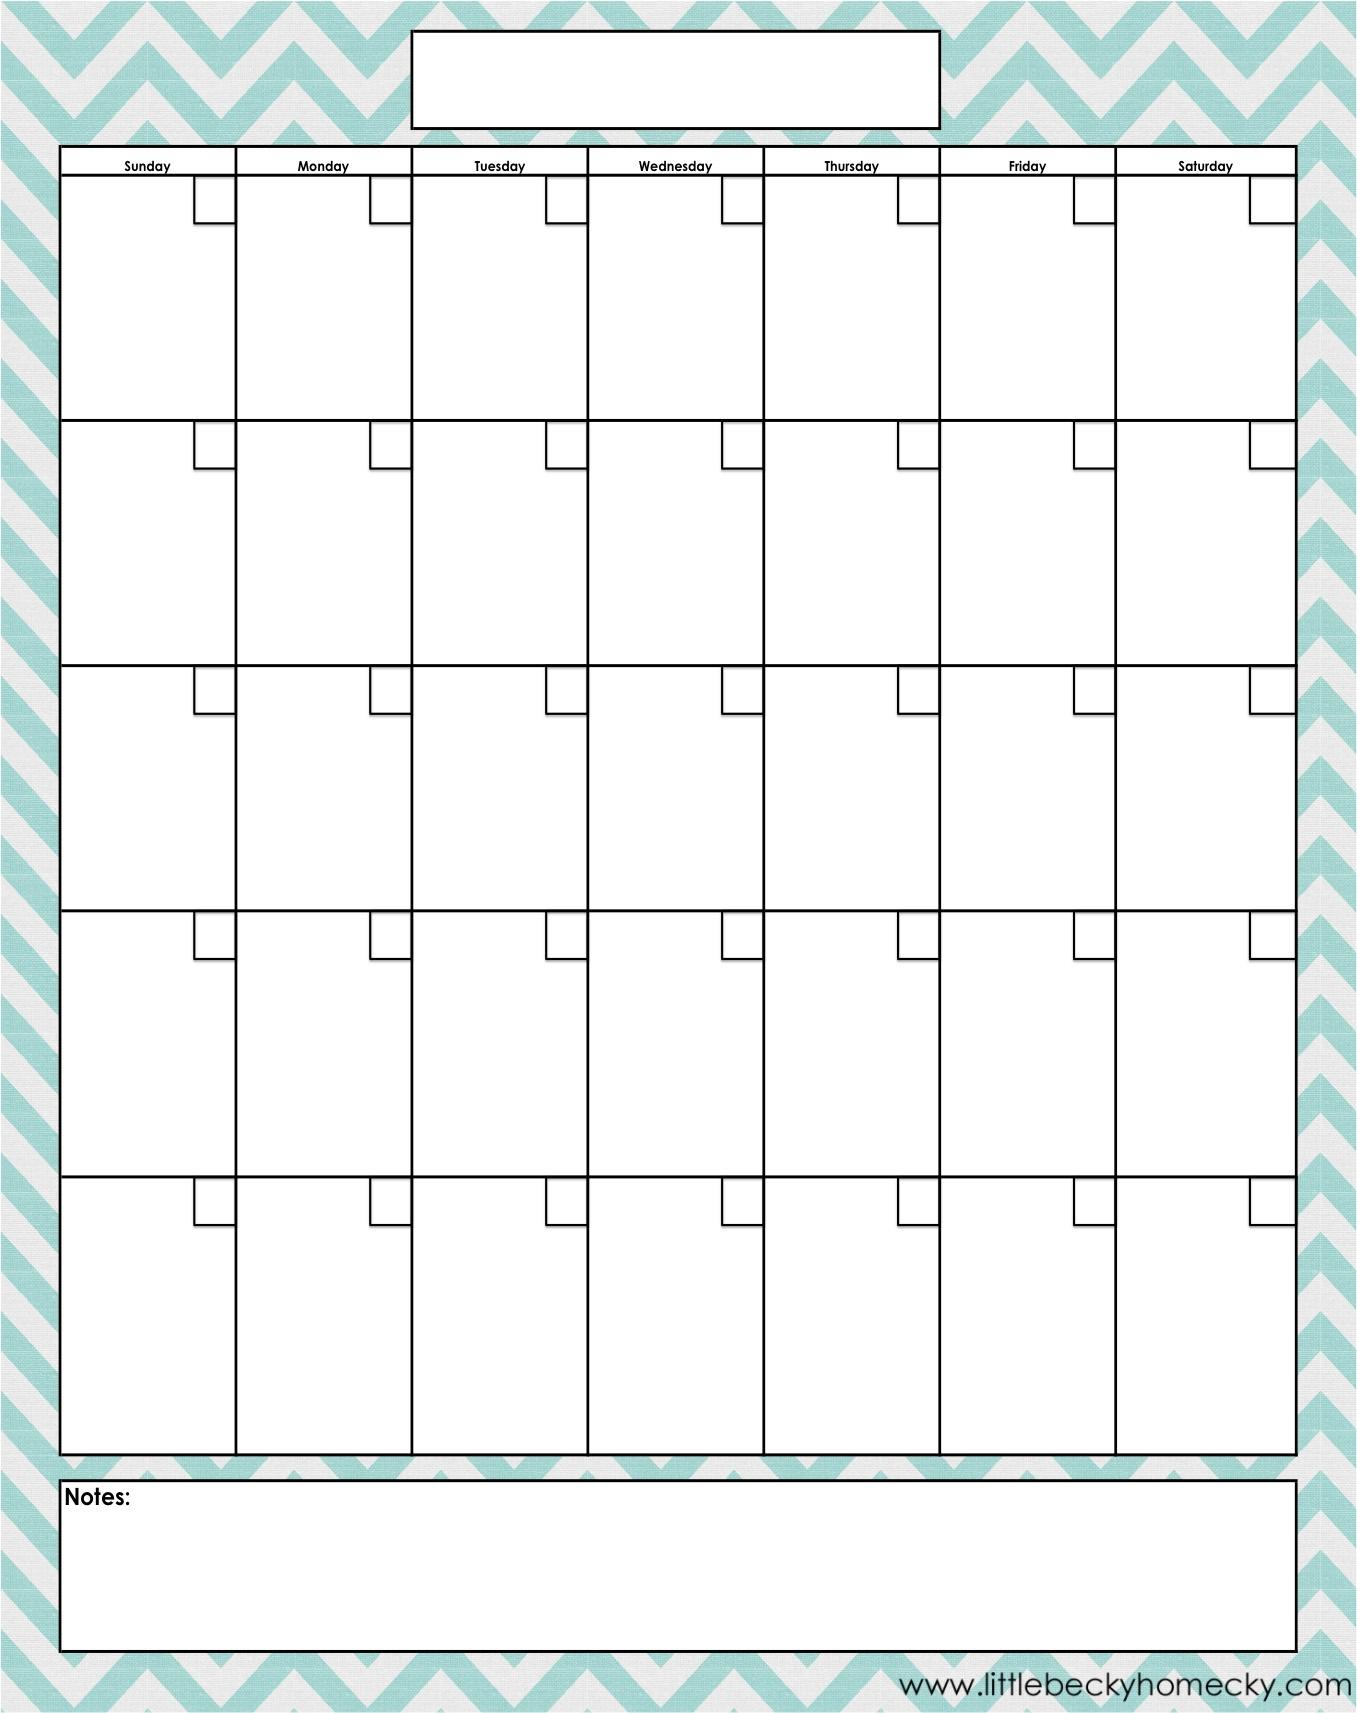 Free Printable Blank Monthly Calendar Templates | Free in Blank 12 Month Calendar